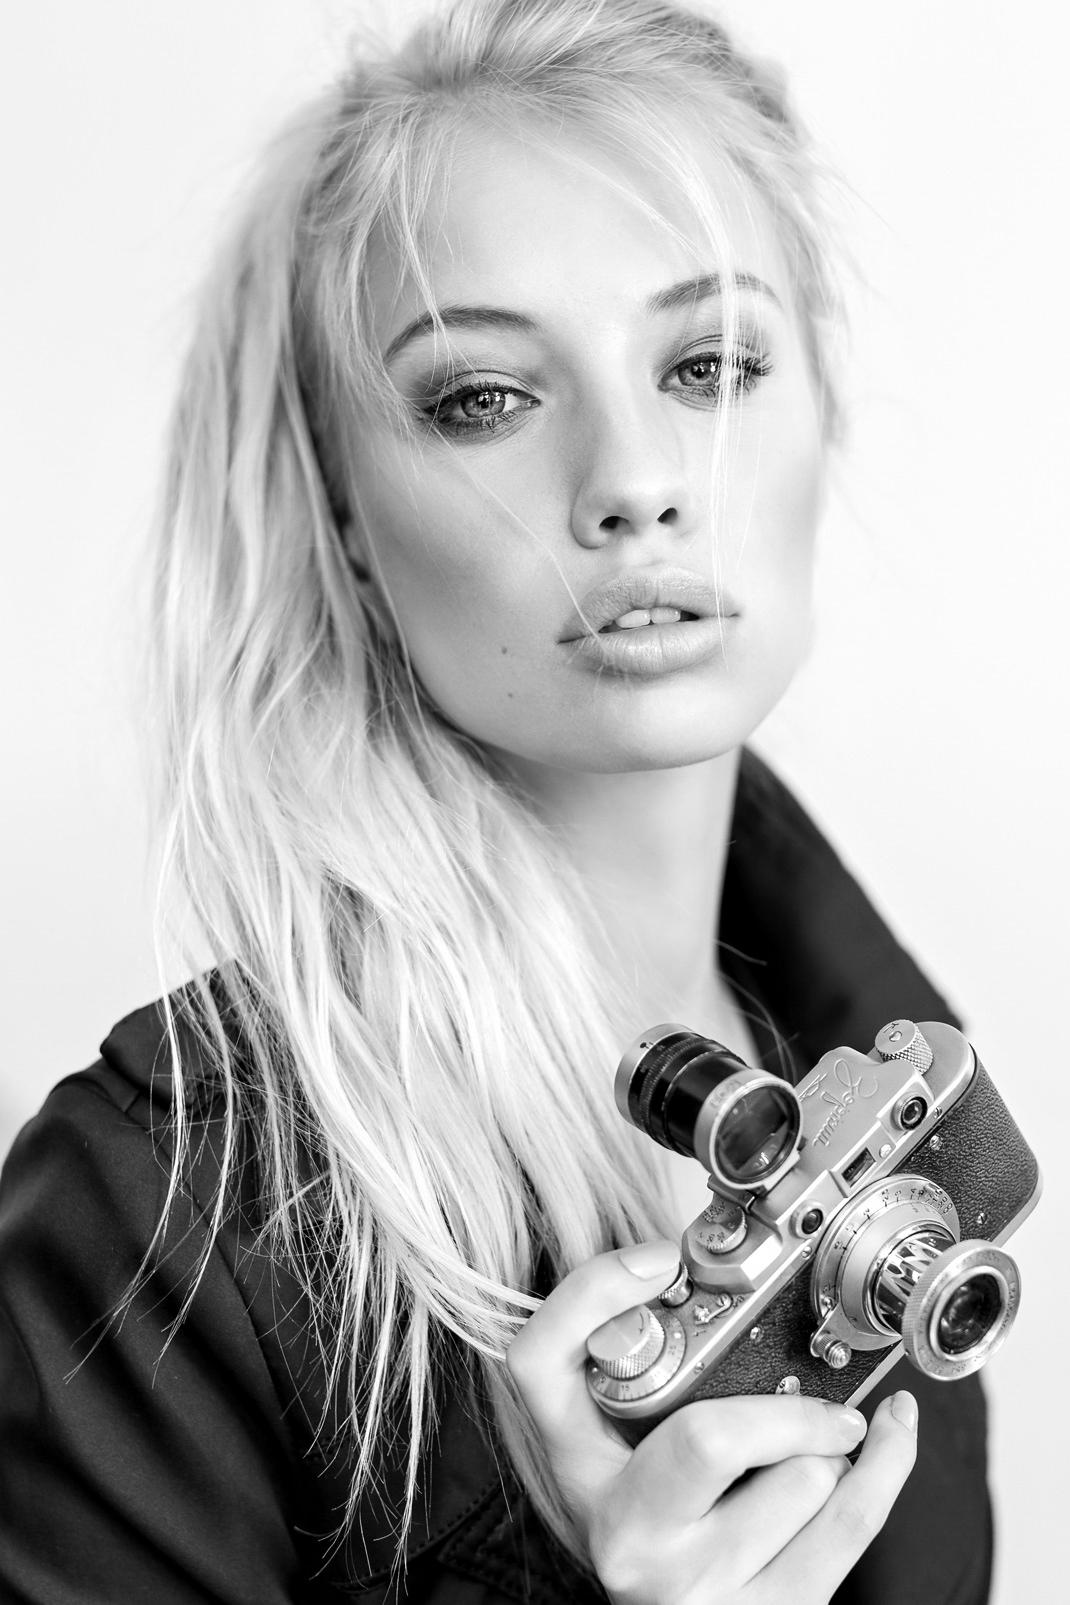 Two Beauties - Linda & Zorki Leica - Markus Hertzsch - Camera - Girl